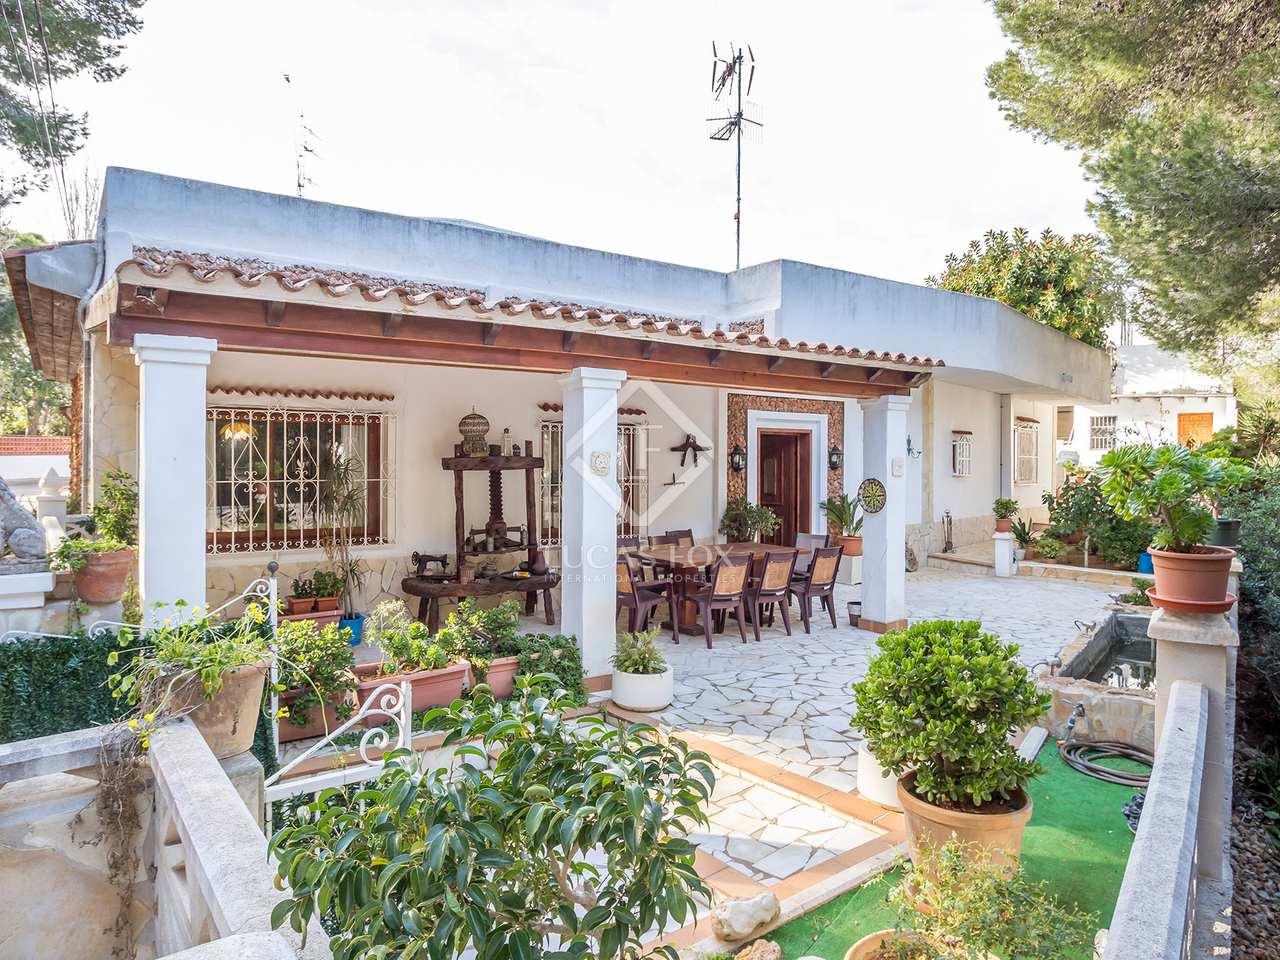 Casa r stica de 160m en venta en santa eulalia ibiza - Apartamentos santa eulalia ibiza ...